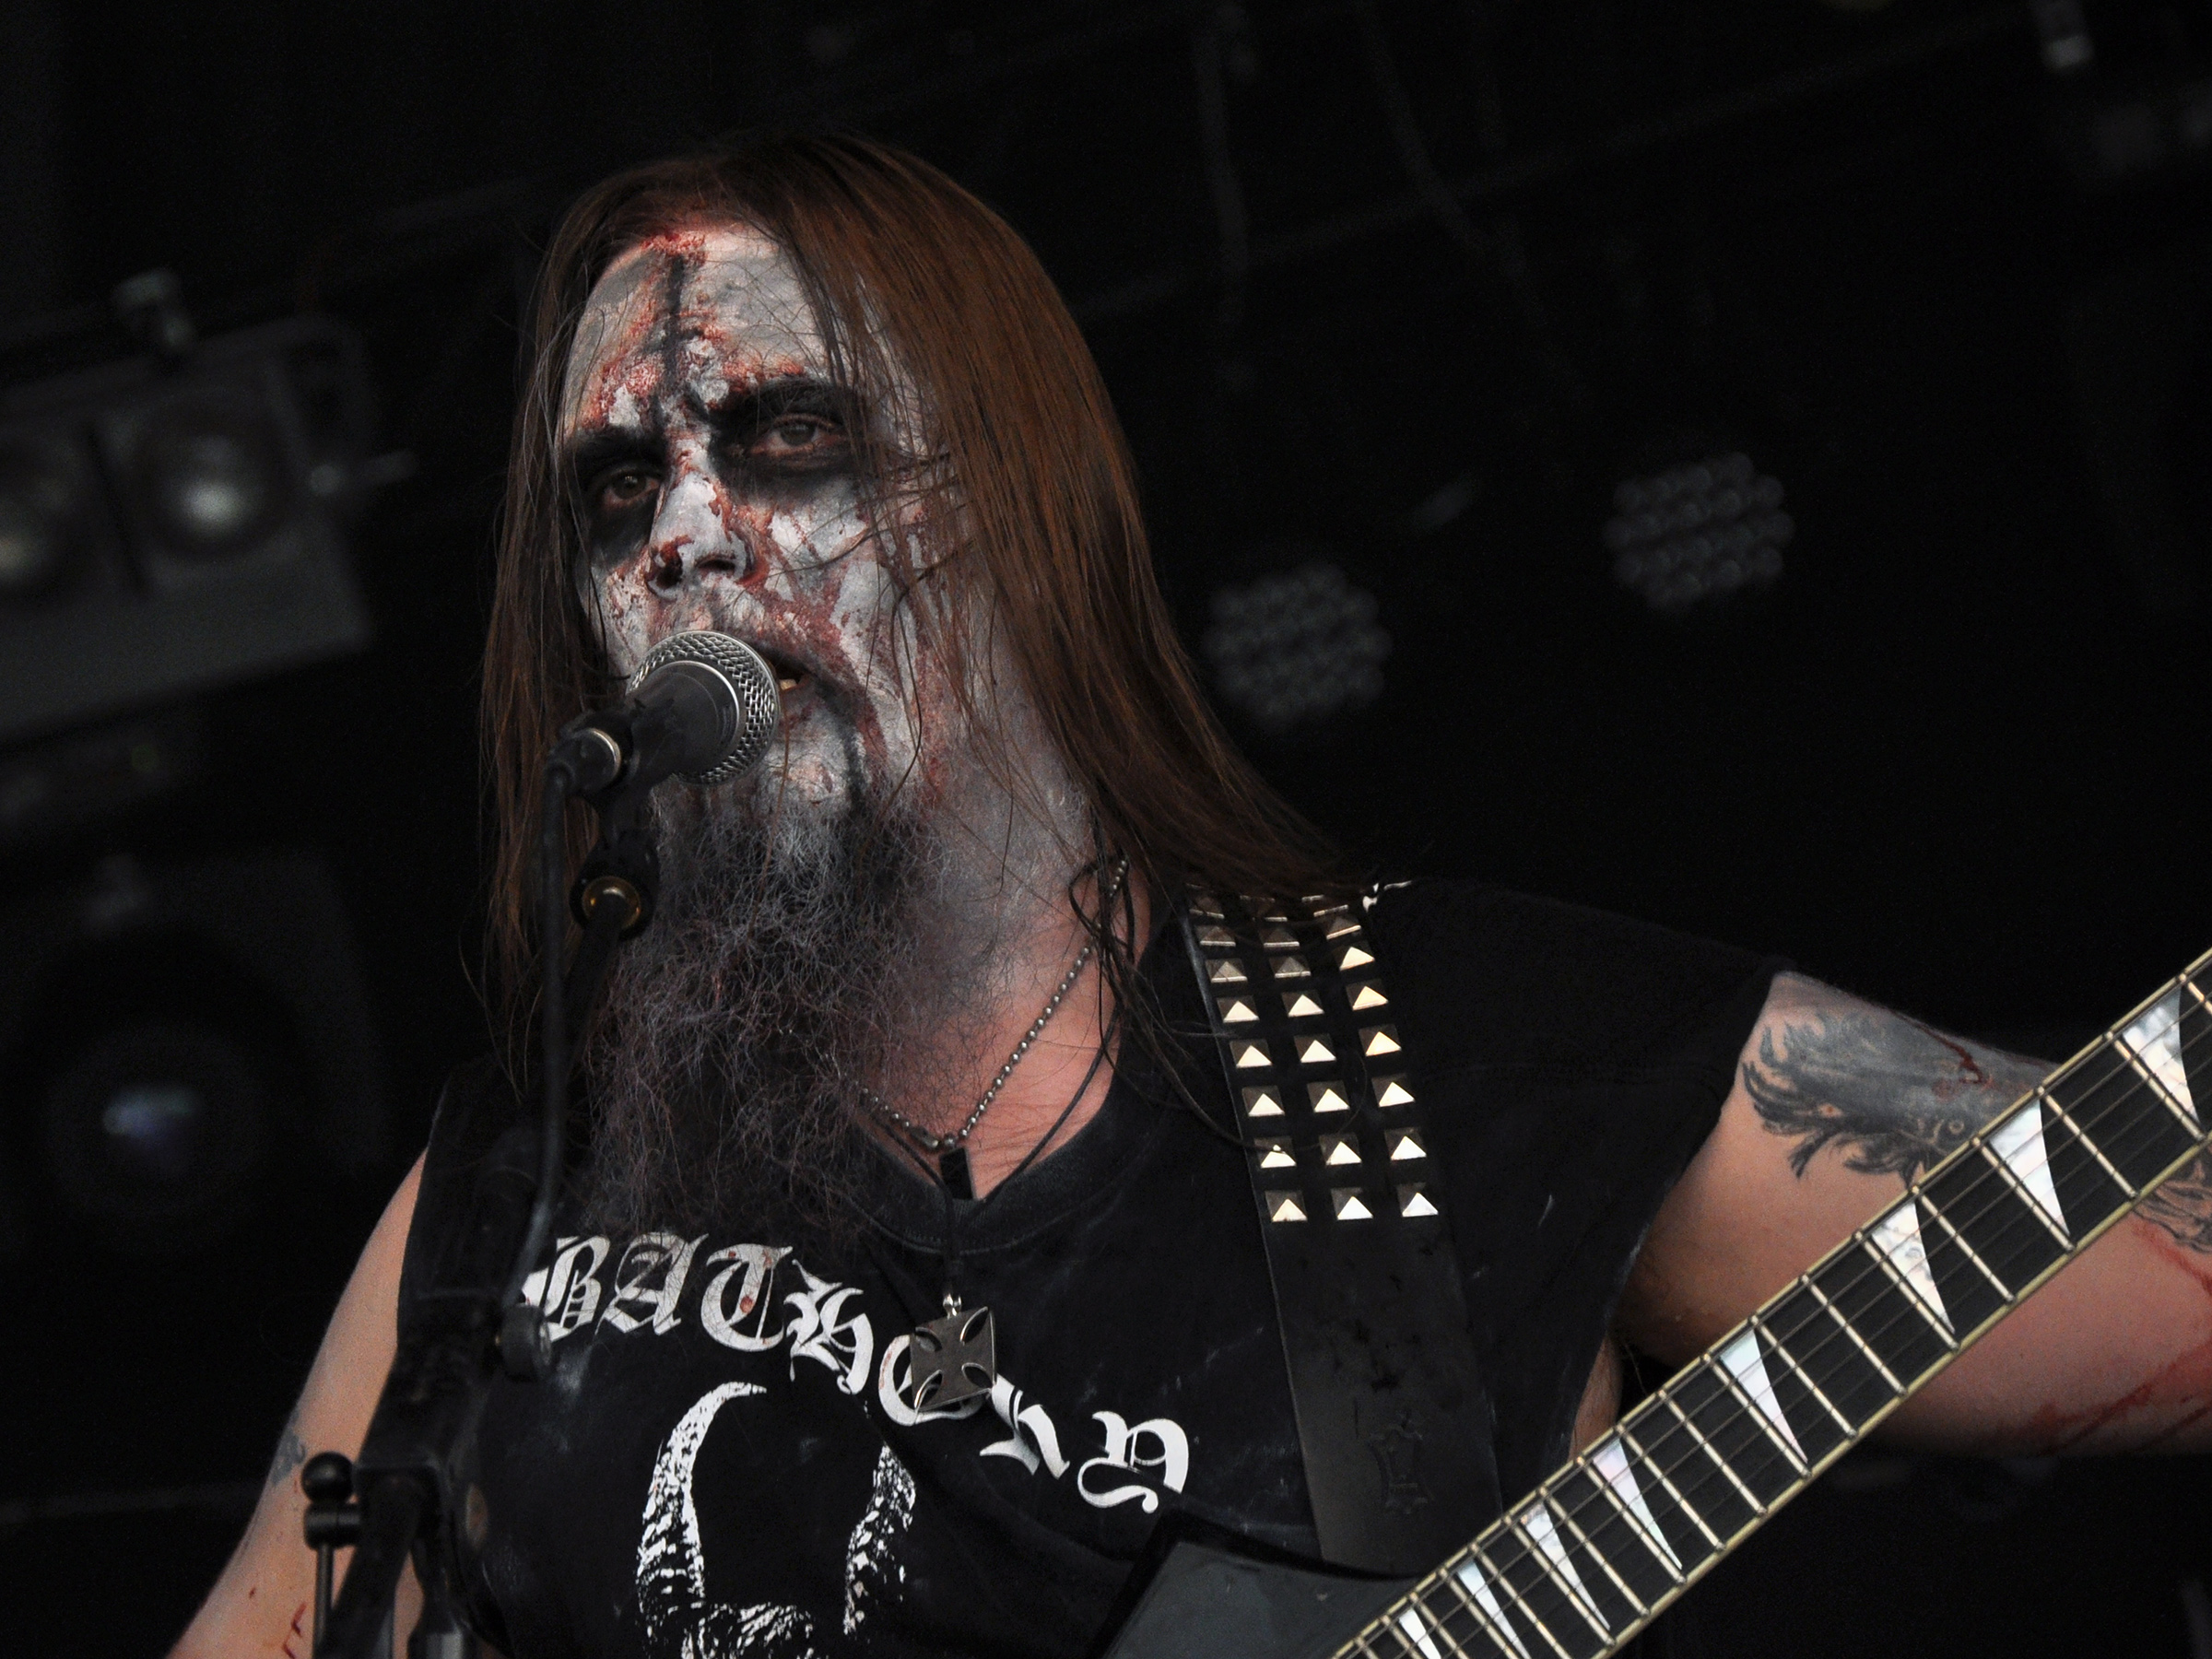 https://upload.wikimedia.org/wikipedia/commons/7/76/Urgehal_Metal_Mean_Festival_20_08_2011_01.jpg